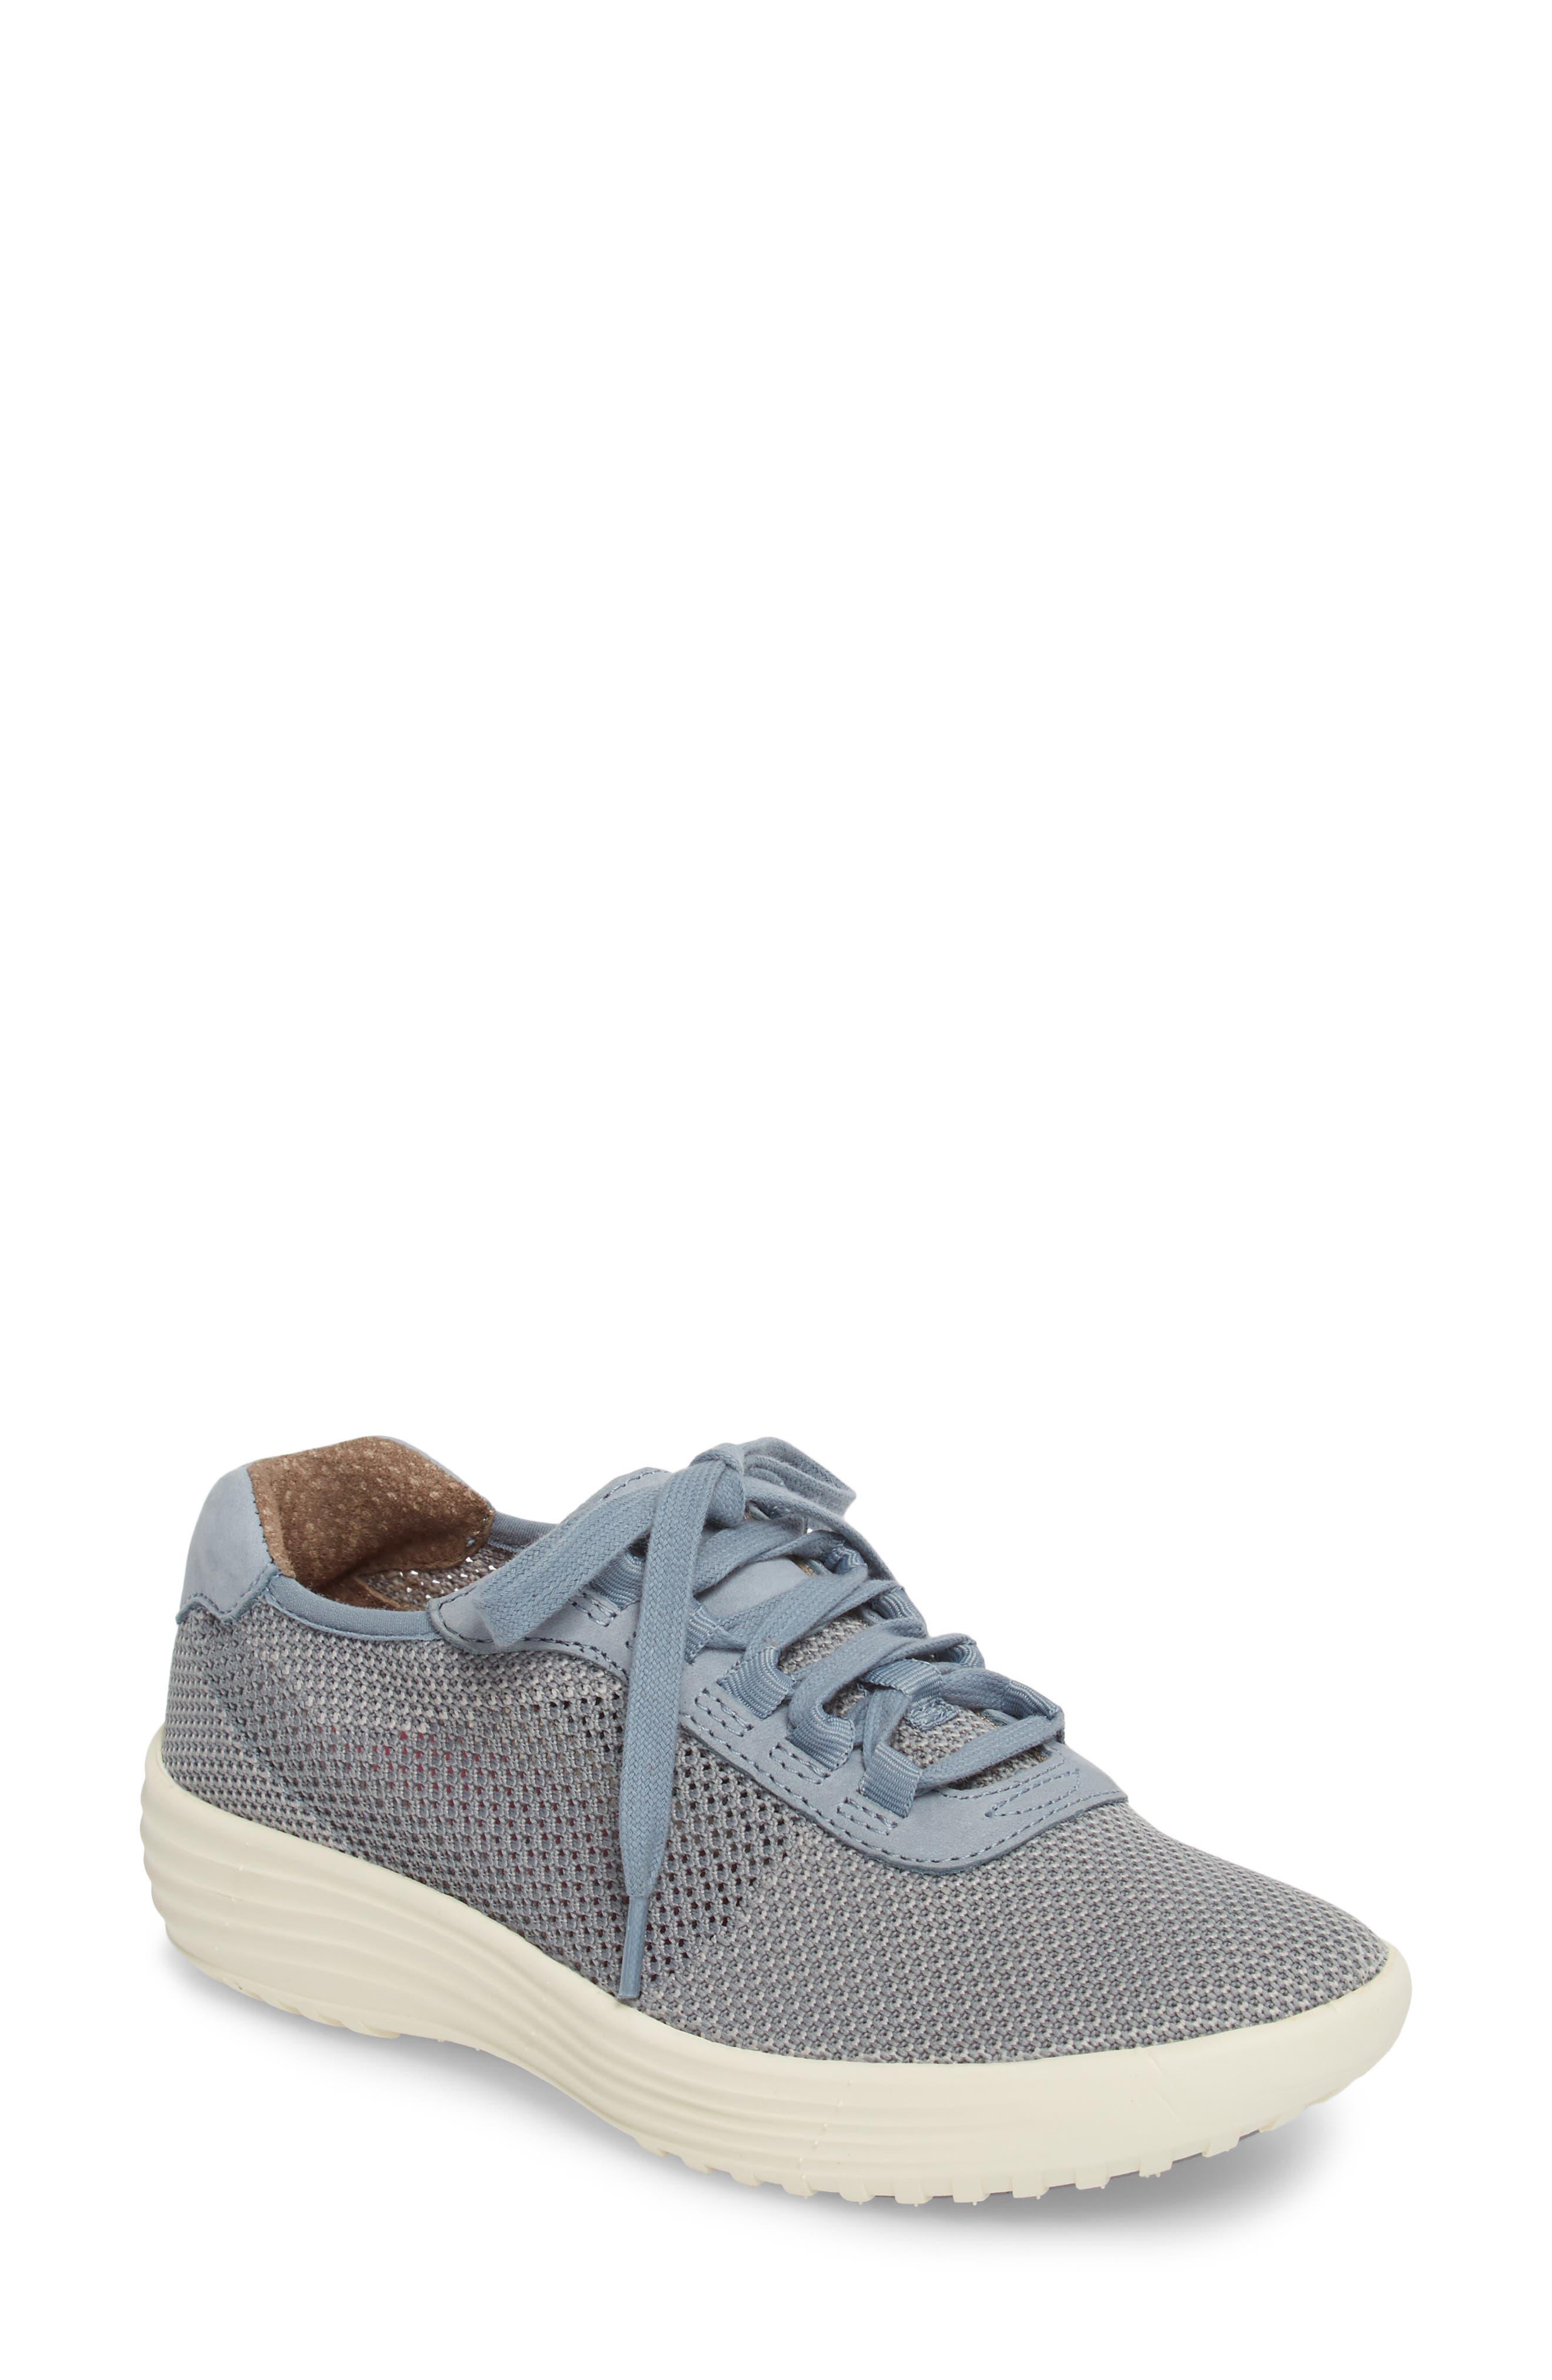 Malibu Sneaker,                         Main,                         color, Chambray Grey Knit Fabric